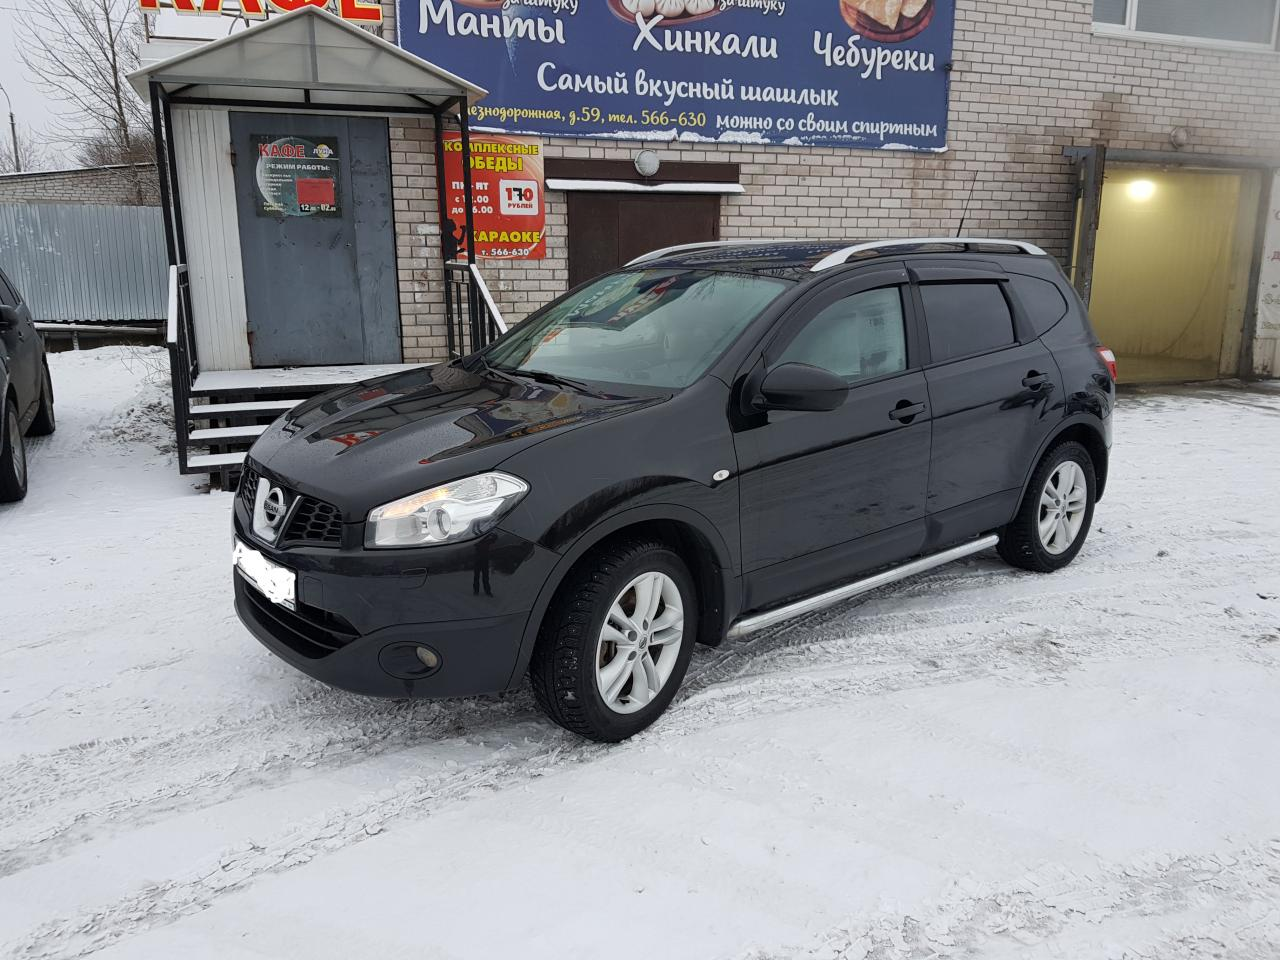 Nissan Qashqai 2011 г.в. г.Северодвинск - фото 2